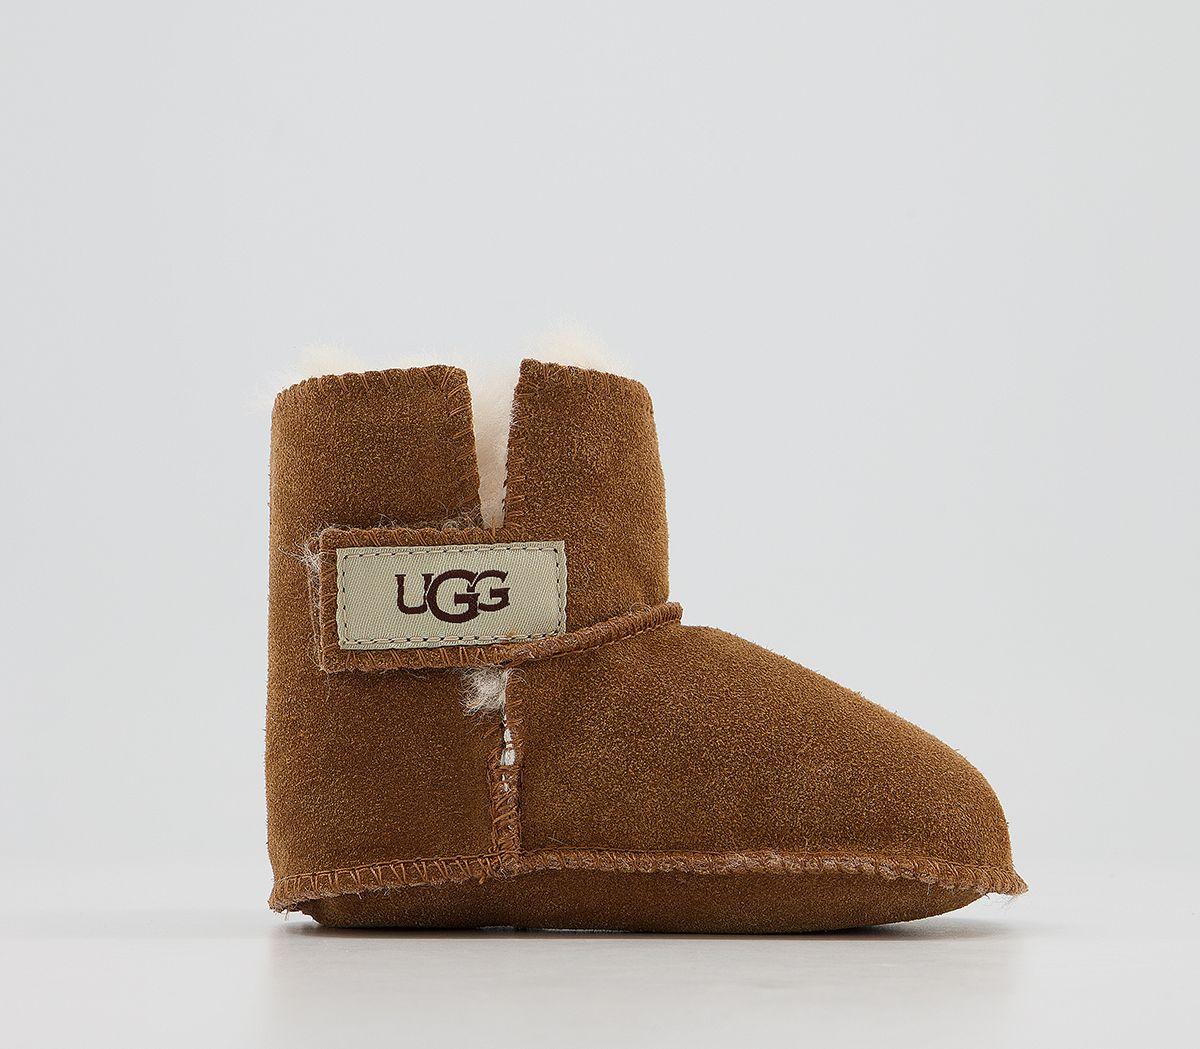 b4cfe0bf4981 UGG Erin Boots Chestnut - Unisex